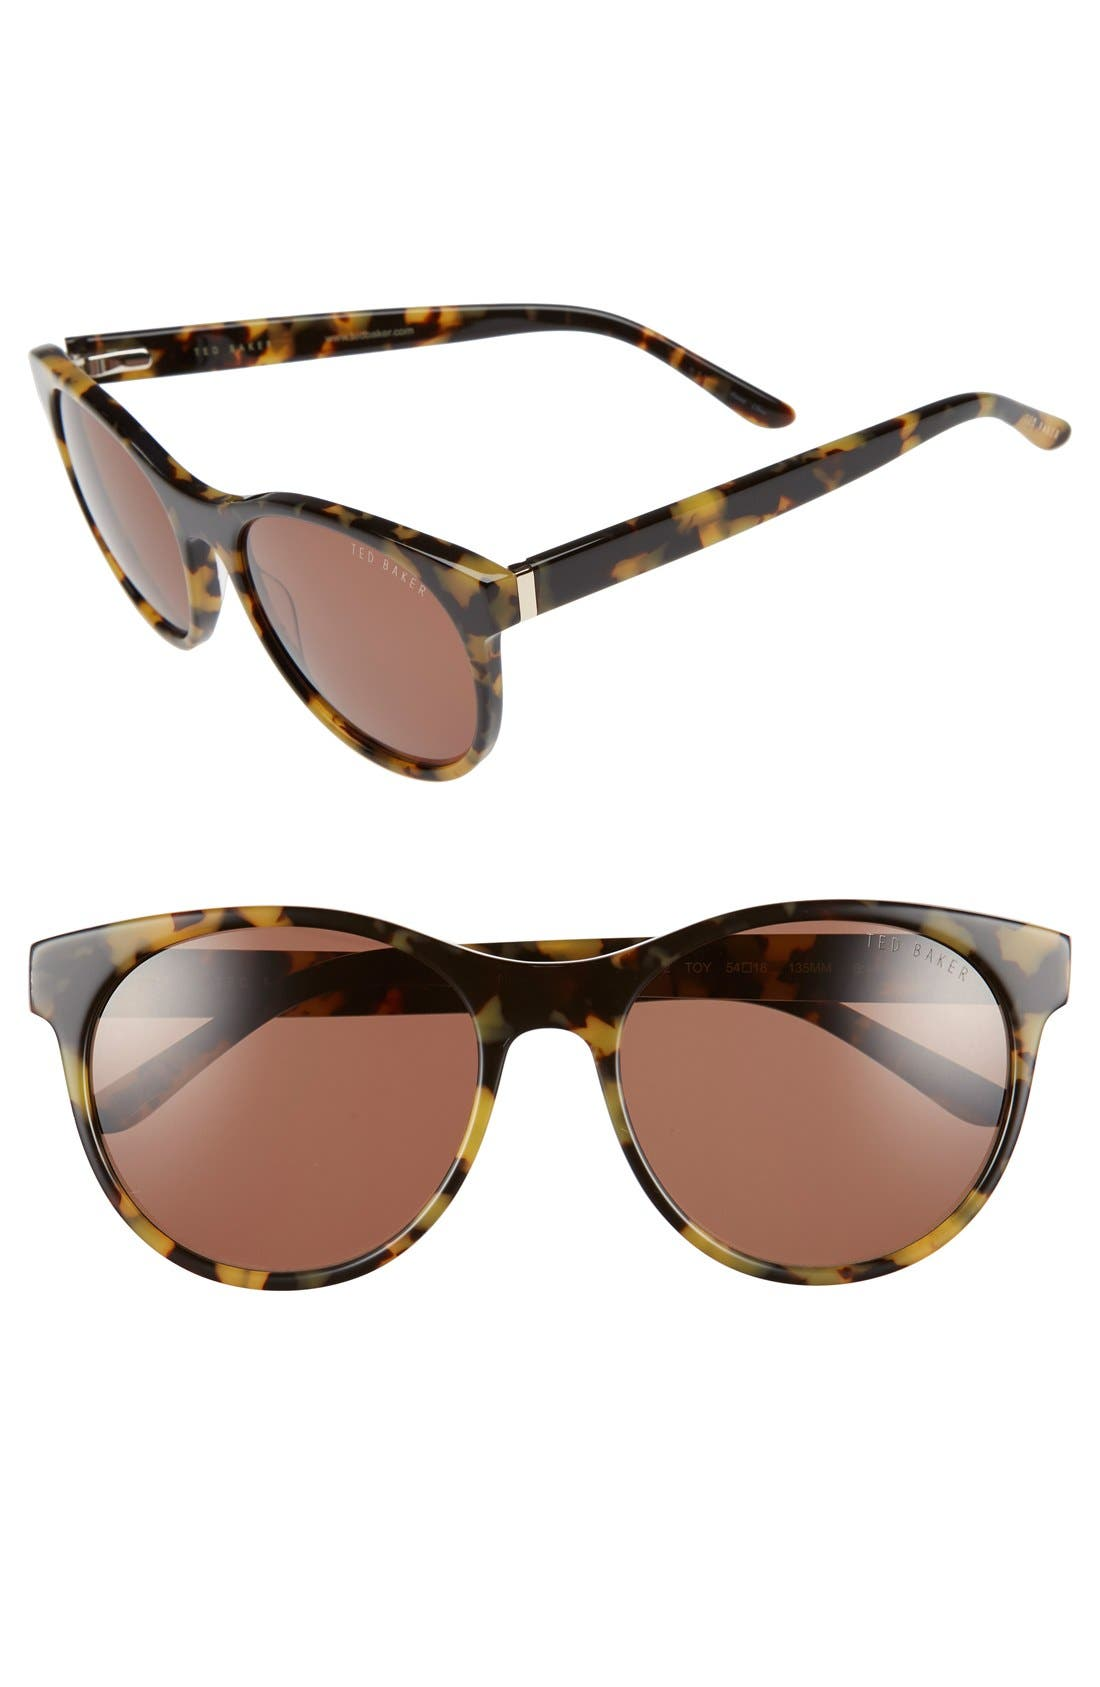 Main Image - Ted Baker London 54mm Retro Sunglasses